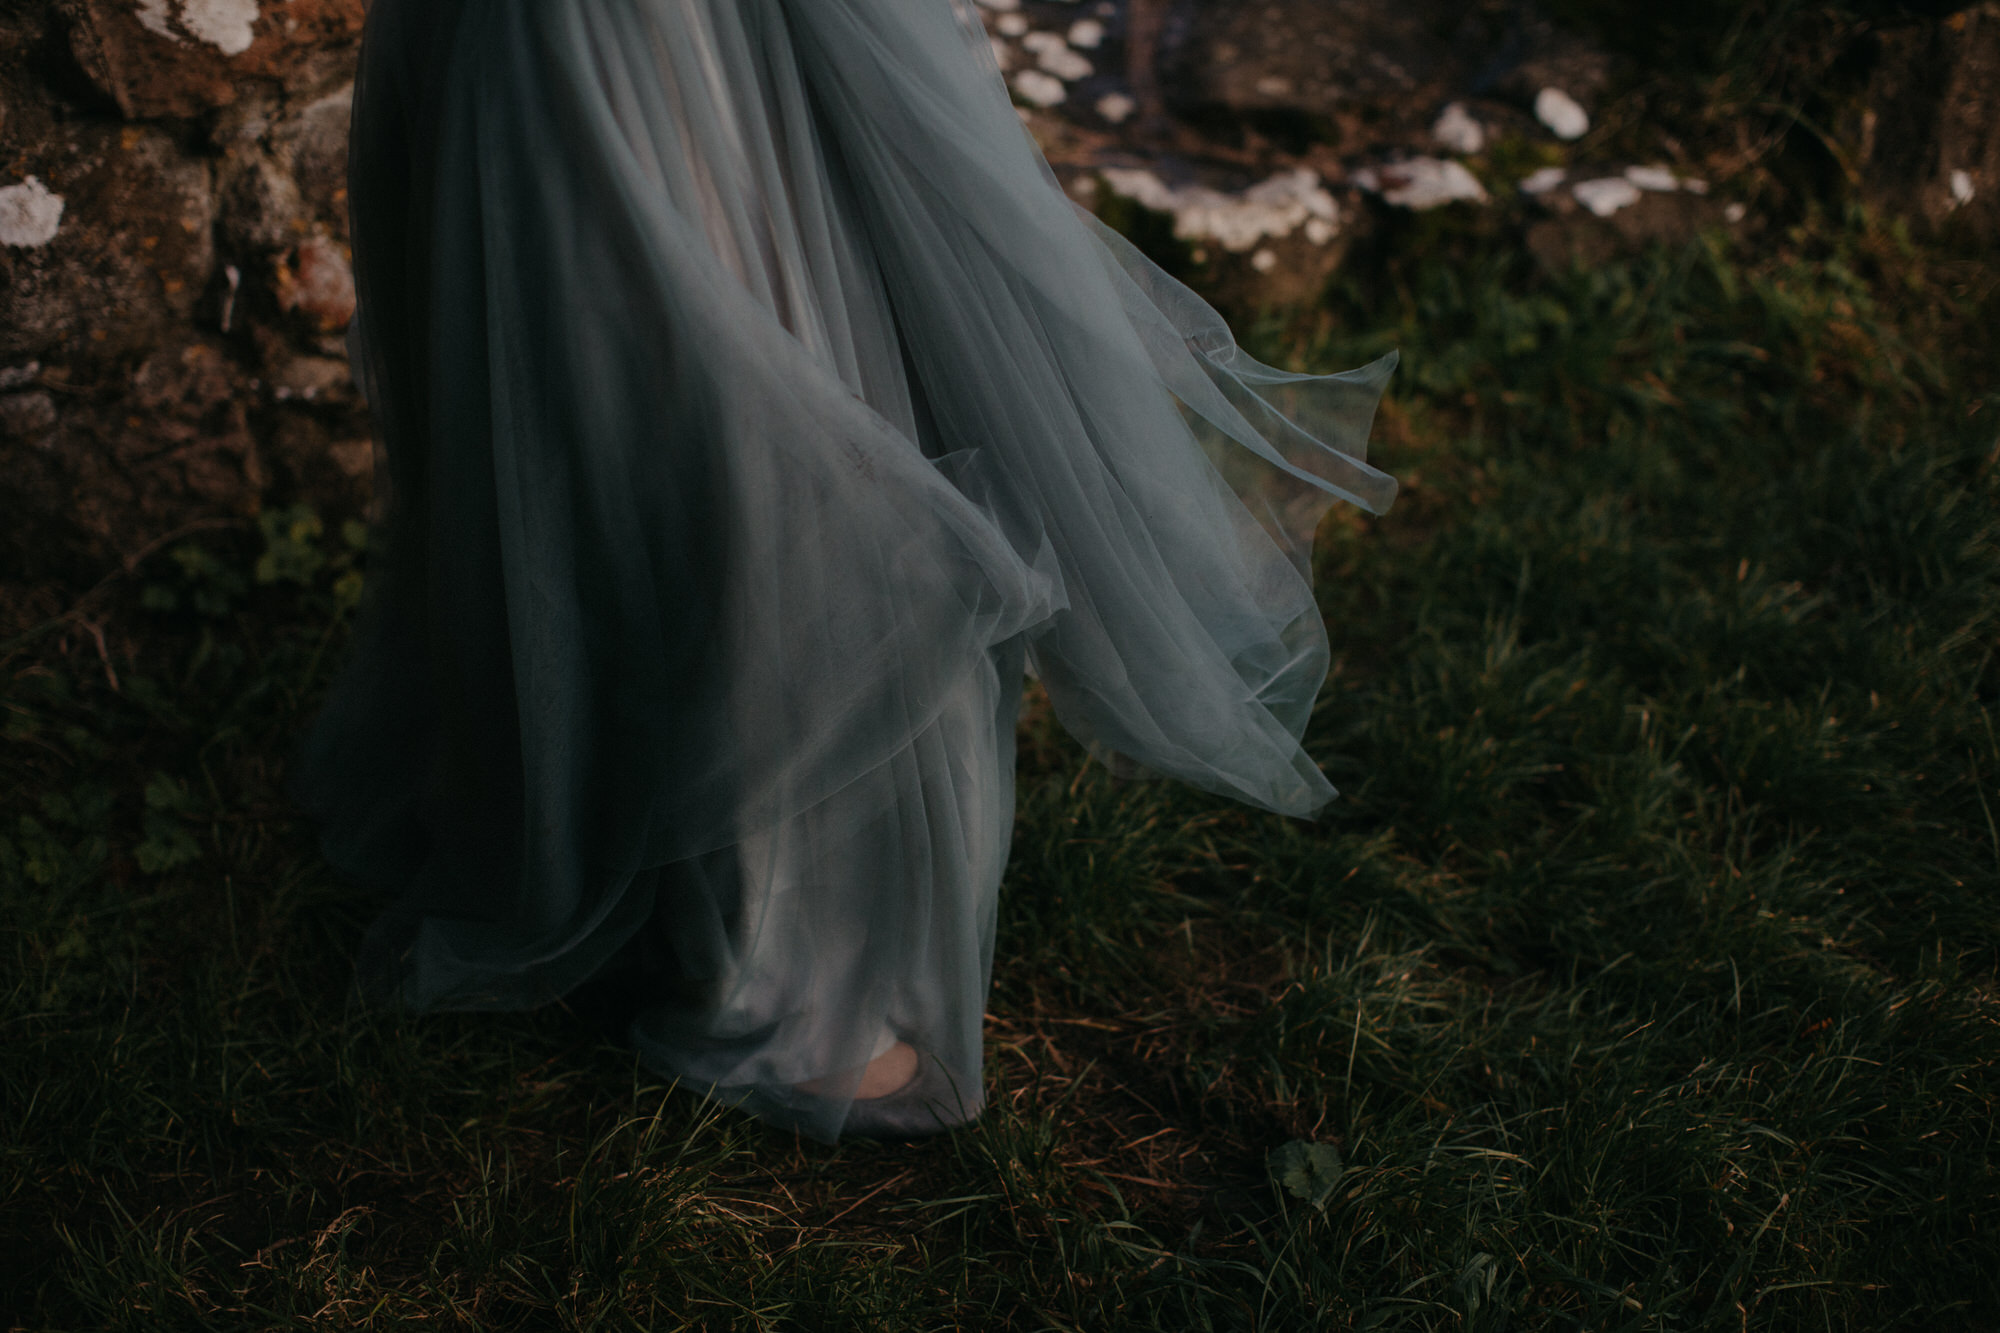 A Soft Blue Grey Tulle Dress For A Romantic Autumn Castle Wedding